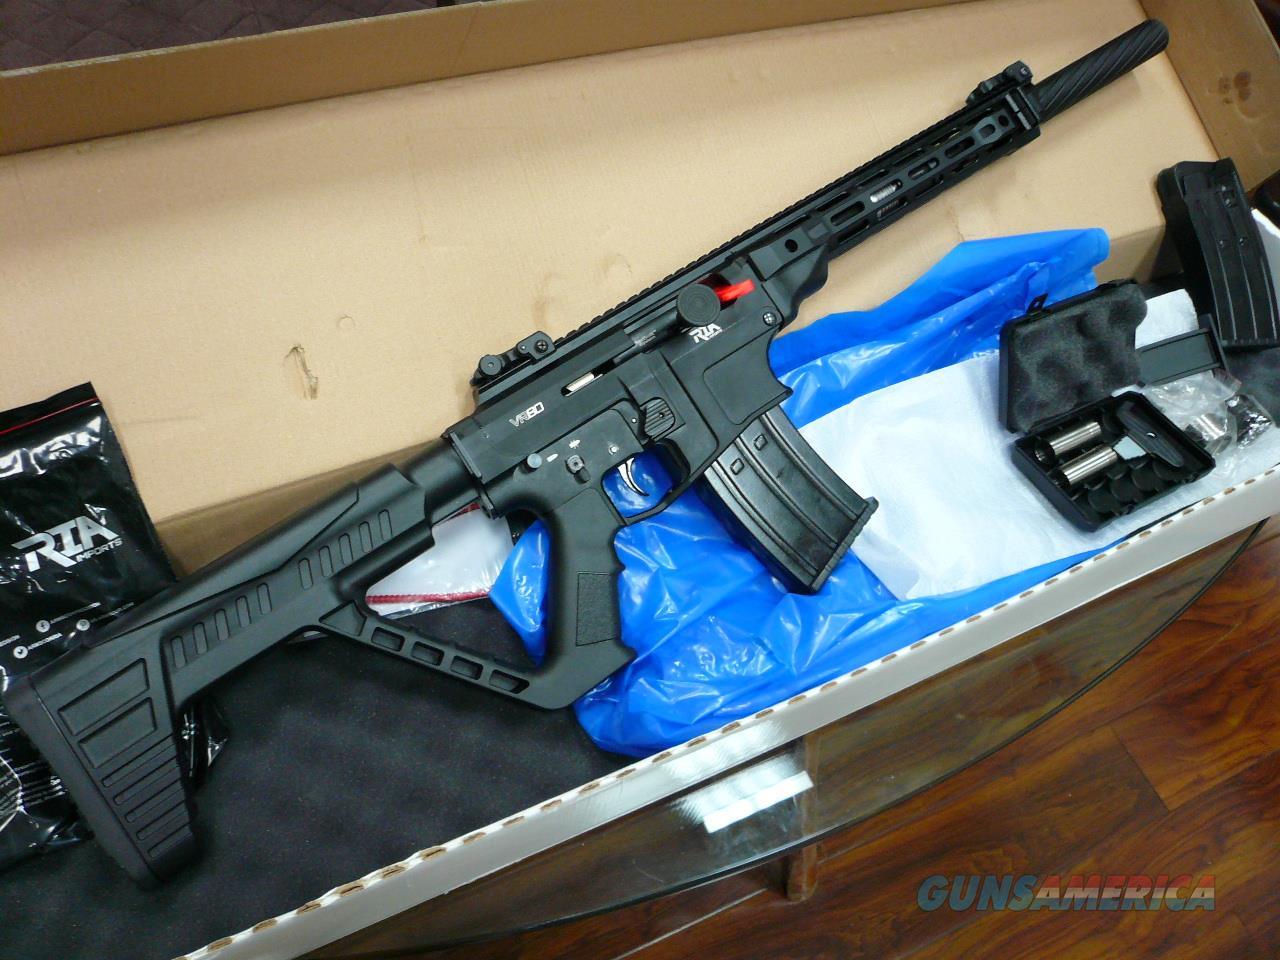 ARMSCOR MODEL-VR-80 (CA COMPLAINT)  Guns > Shotguns > Rock Island Shotguns